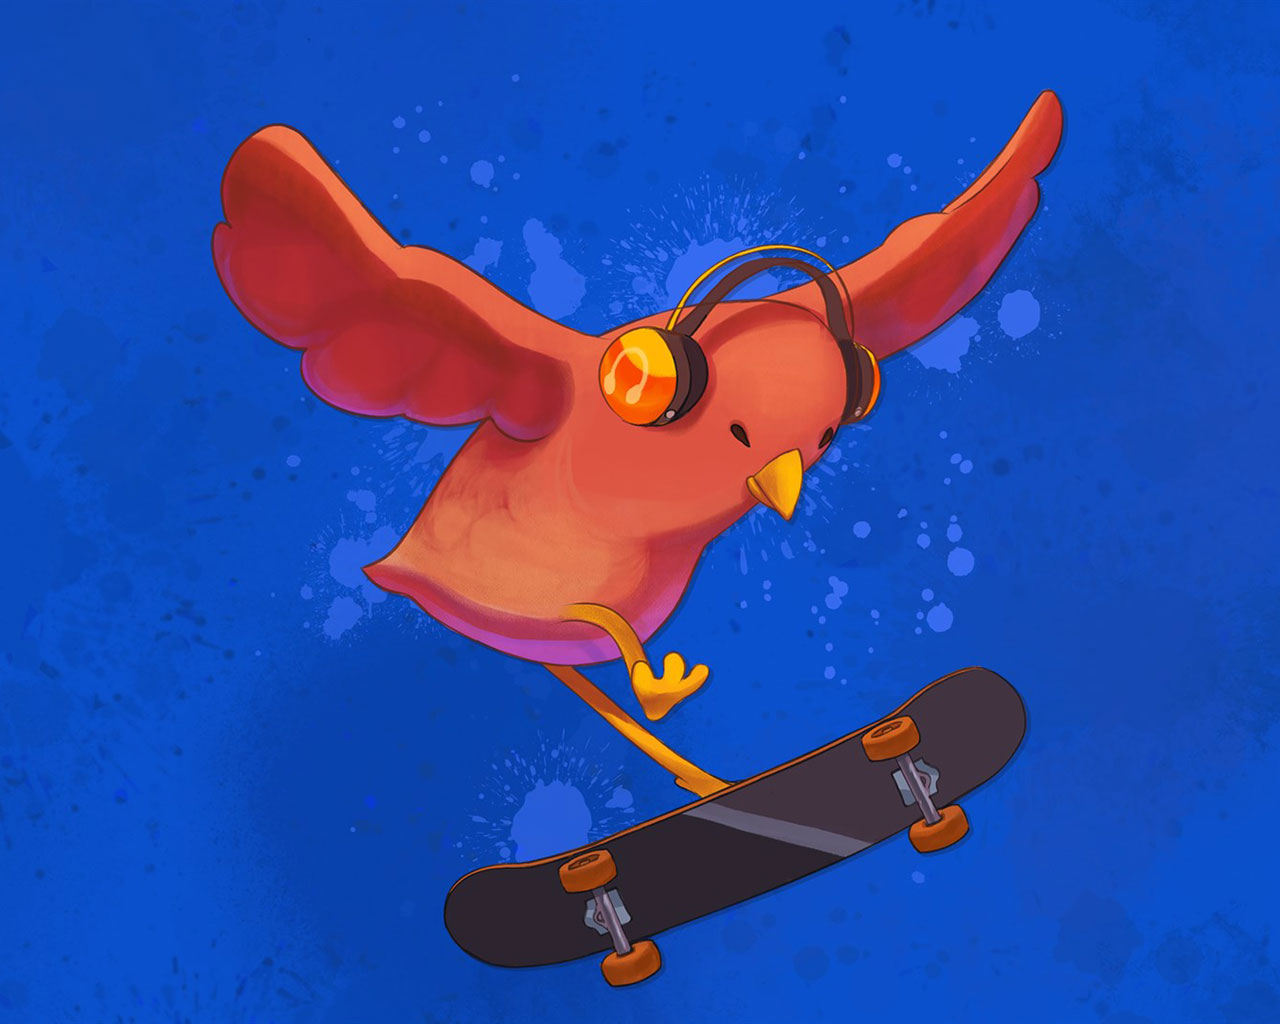 Free Skatebird Wallpaper in 1280x1024